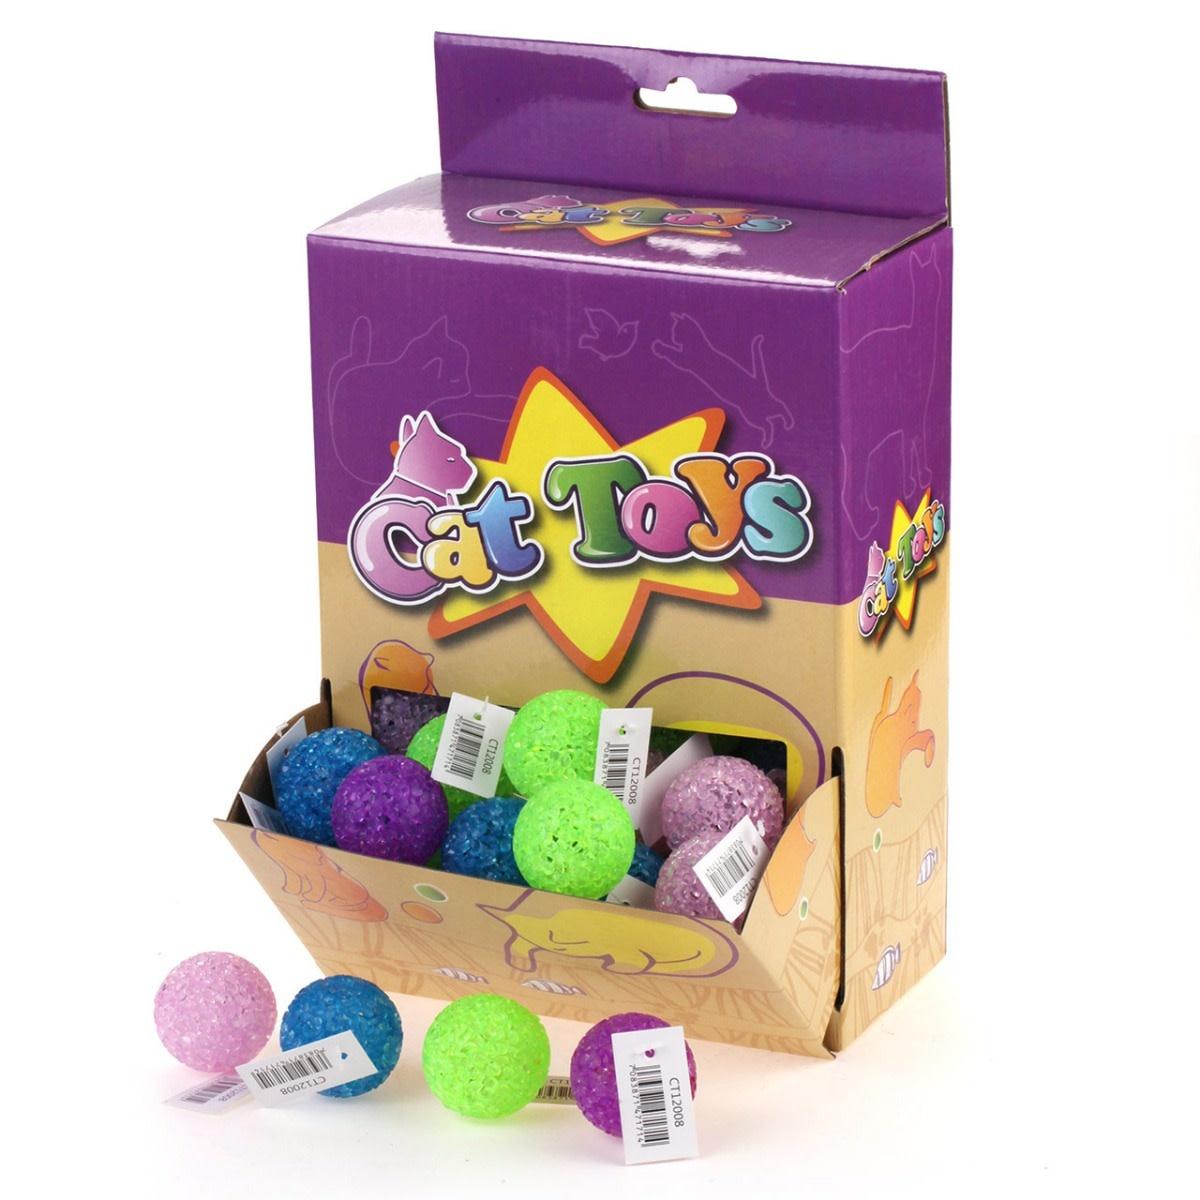 Cat Toys - Glitter Catnip Ball